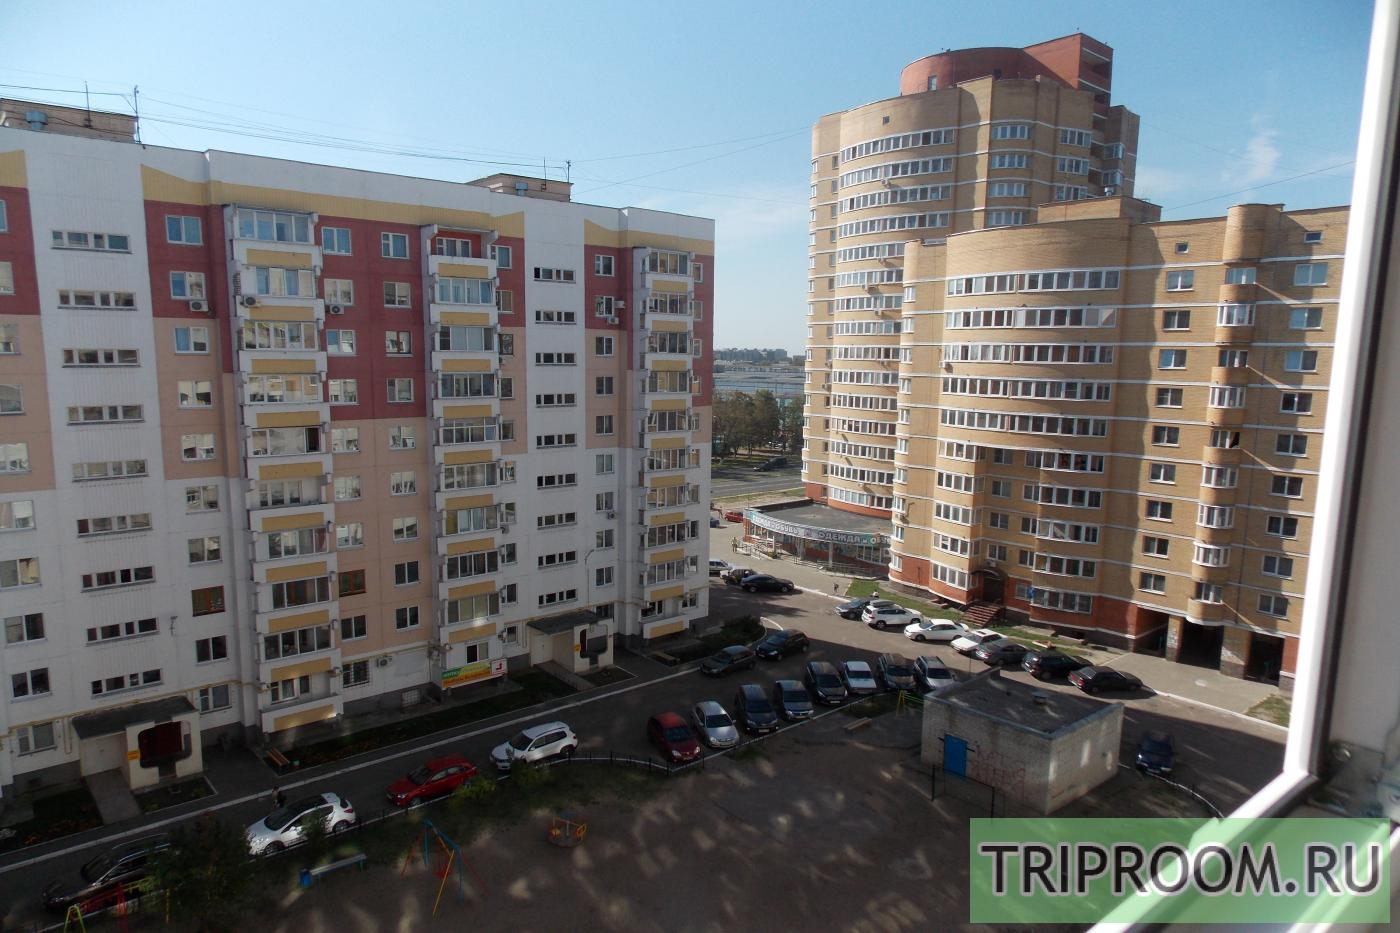 1-комнатная квартира посуточно (вариант № 15993), ул. Московский проспект, фото № 5